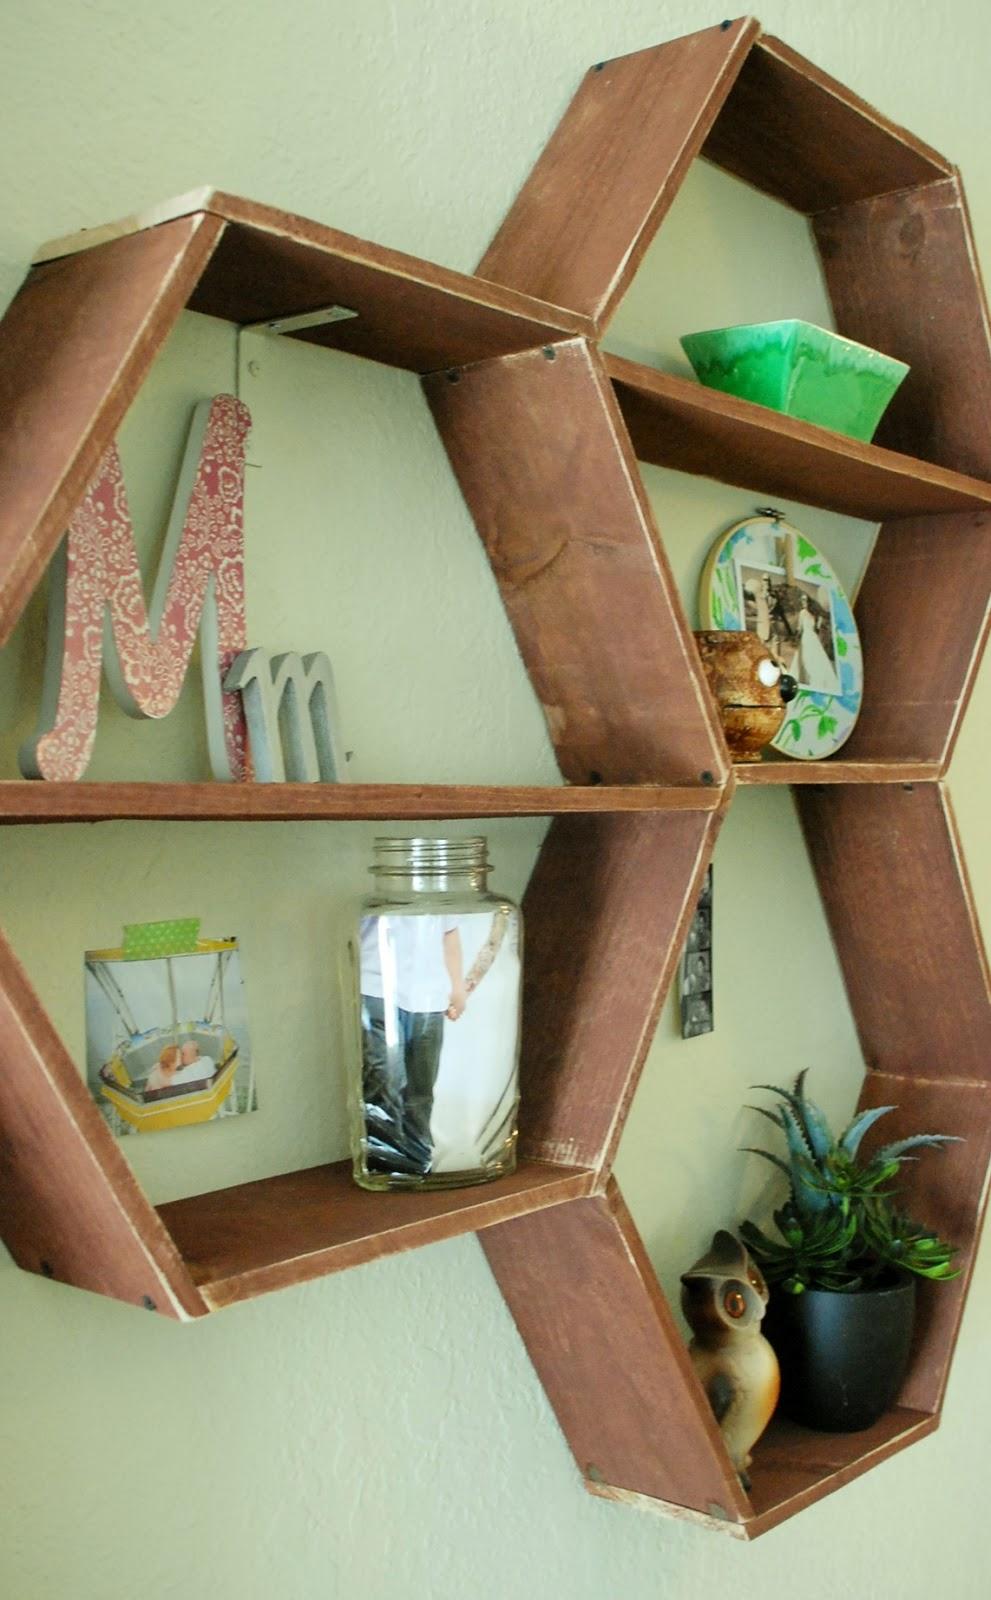 Honeycomb shelves house : Honeycomb display shelving